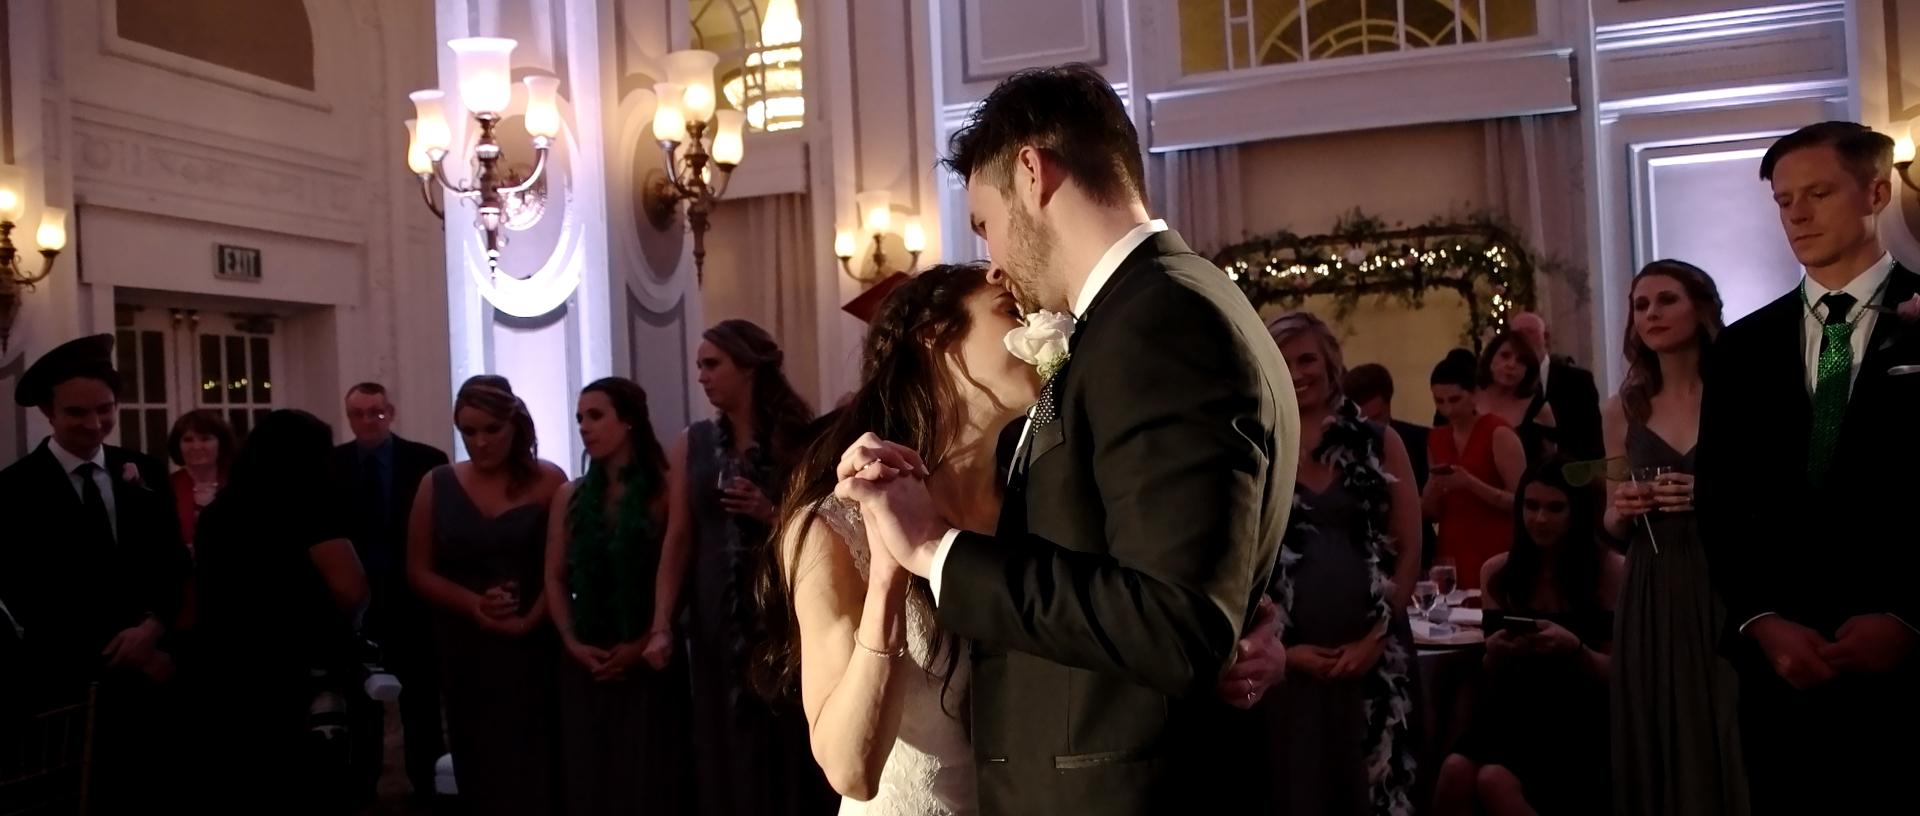 Atlanta Wedding Videographer0035.jpg